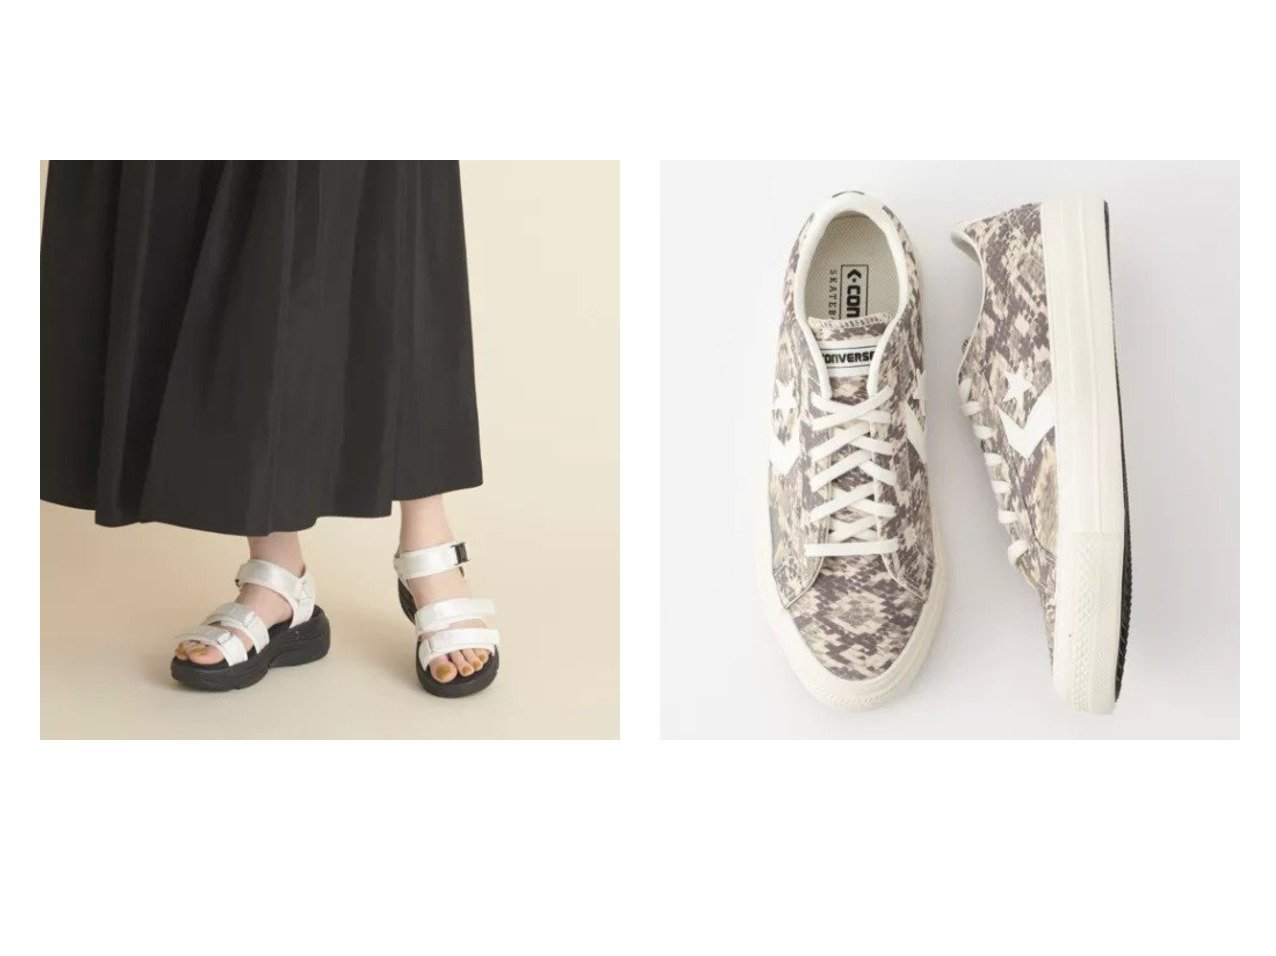 【Odette e Odile/オデット エ オディール】の【WEB限定】O 3ベルトバックル サンダル60●&【NOLLEY'S/ノーリーズ】の【 コンバース】 【WEB限定】プロライドSK SNK OX 【シューズ・靴】おすすめ!人気、トレンド・レディースファッションの通販   おすすめで人気の流行・トレンド、ファッションの通販商品 インテリア・家具・メンズファッション・キッズファッション・レディースファッション・服の通販 founy(ファニー) https://founy.com/ ファッション Fashion レディースファッション WOMEN バッグ Bag ベルト Belts キャンバス クール シューズ スタンダード スニーカー 定番 Standard パイソン モノトーン サンダル スポーツ  ID:crp329100000052232